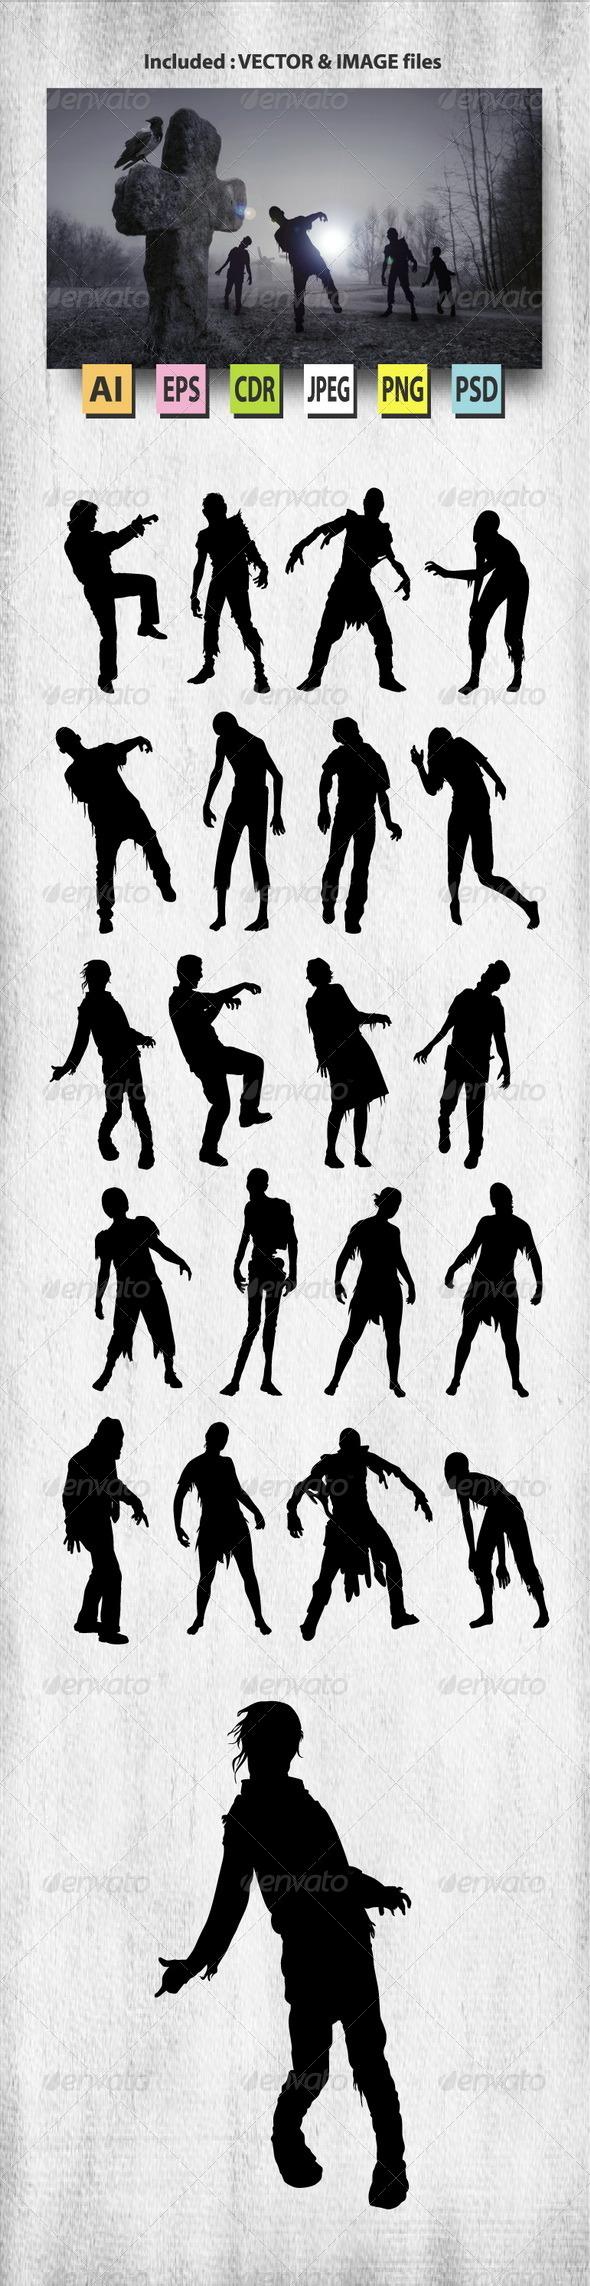 GraphicRiver Zombie Silhouettes 8188557